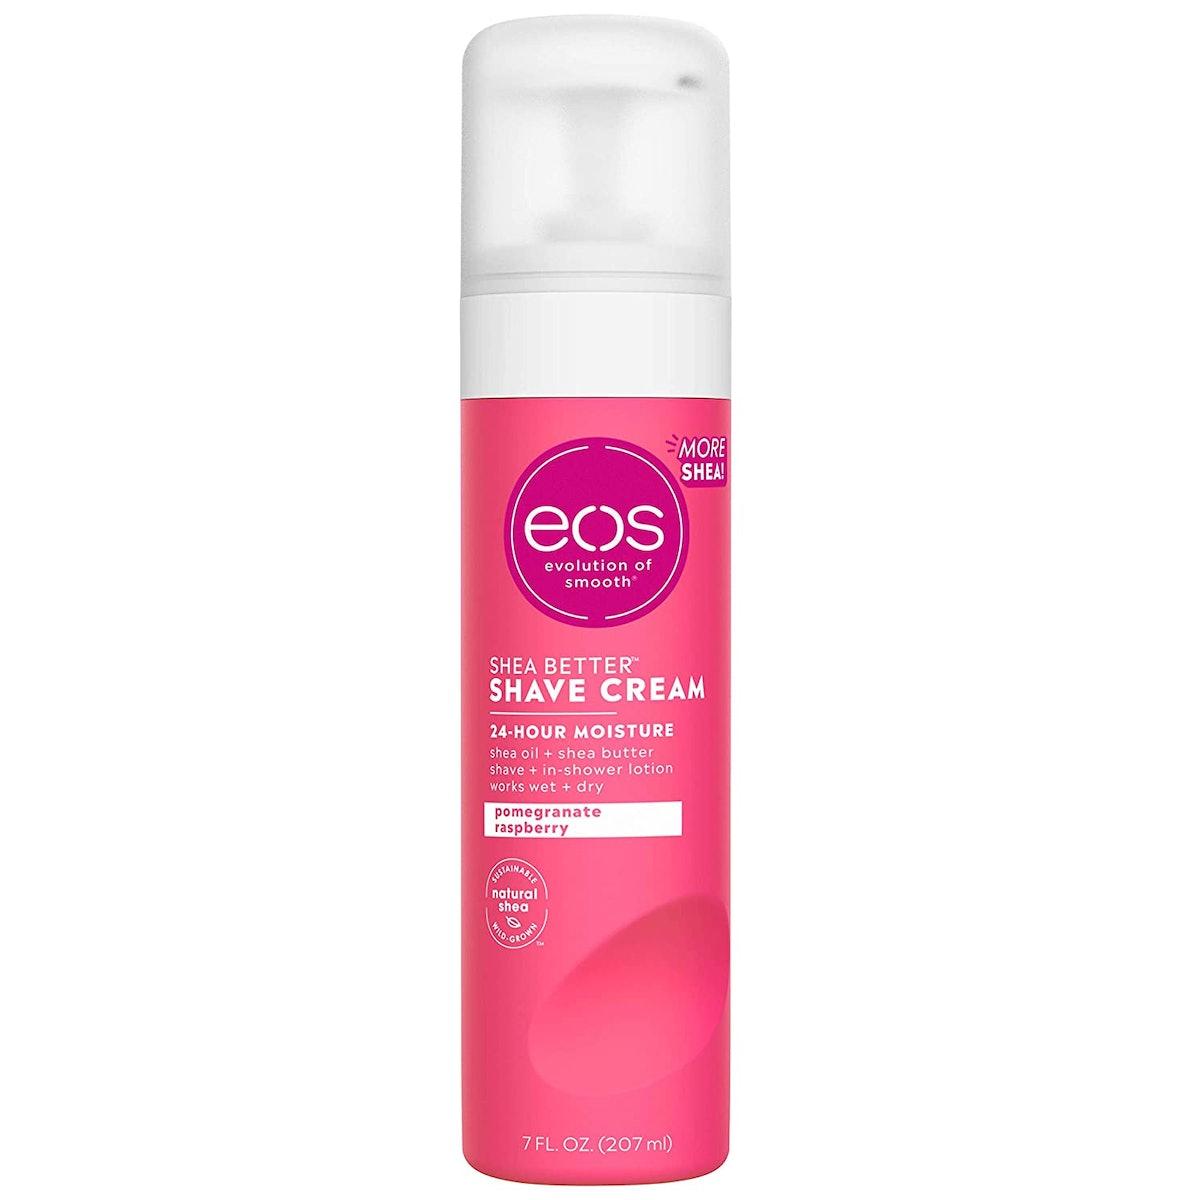 eos Shea Better Shave Cream